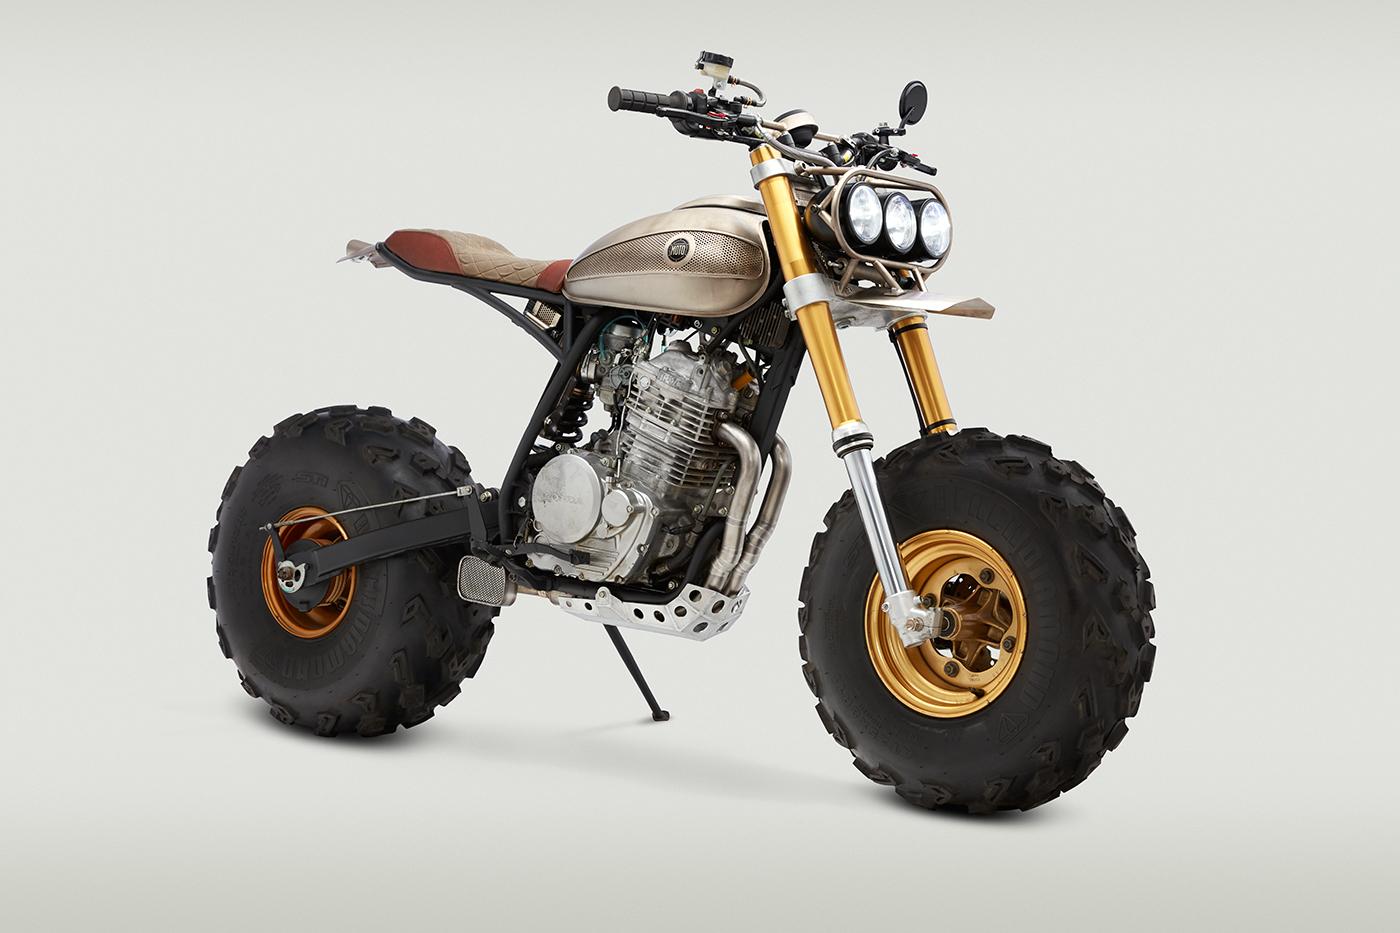 BW650 Big Wheel - Classified Moto